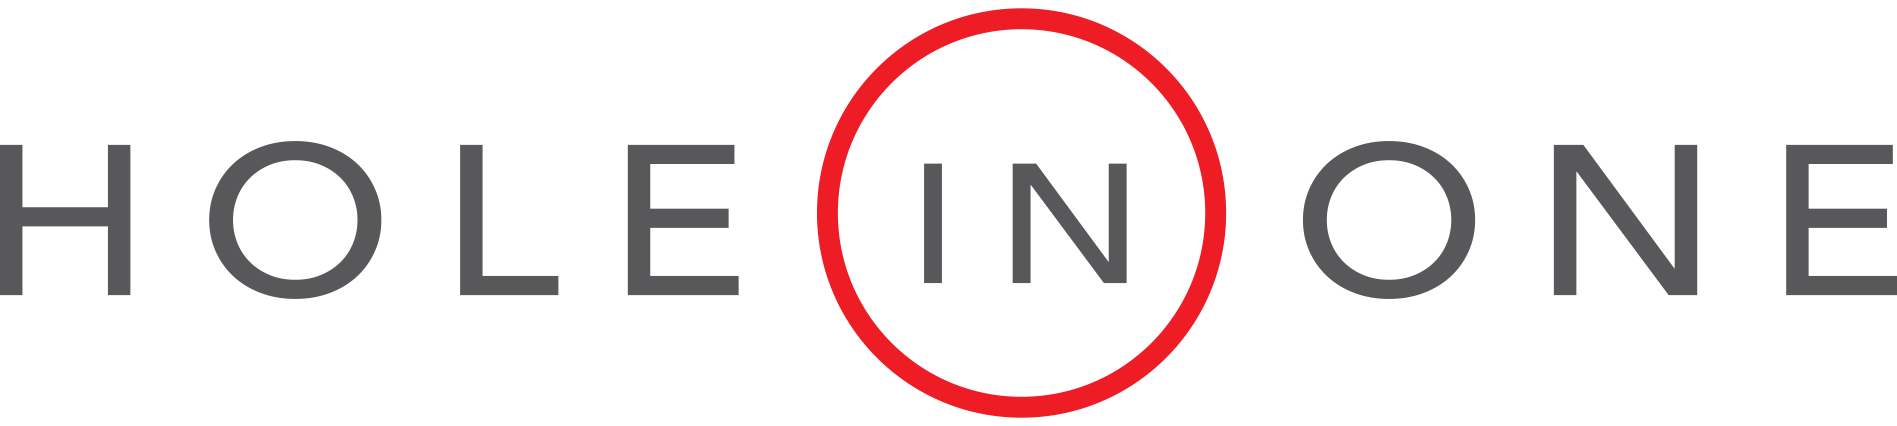 holeinone-logo-long copie.png